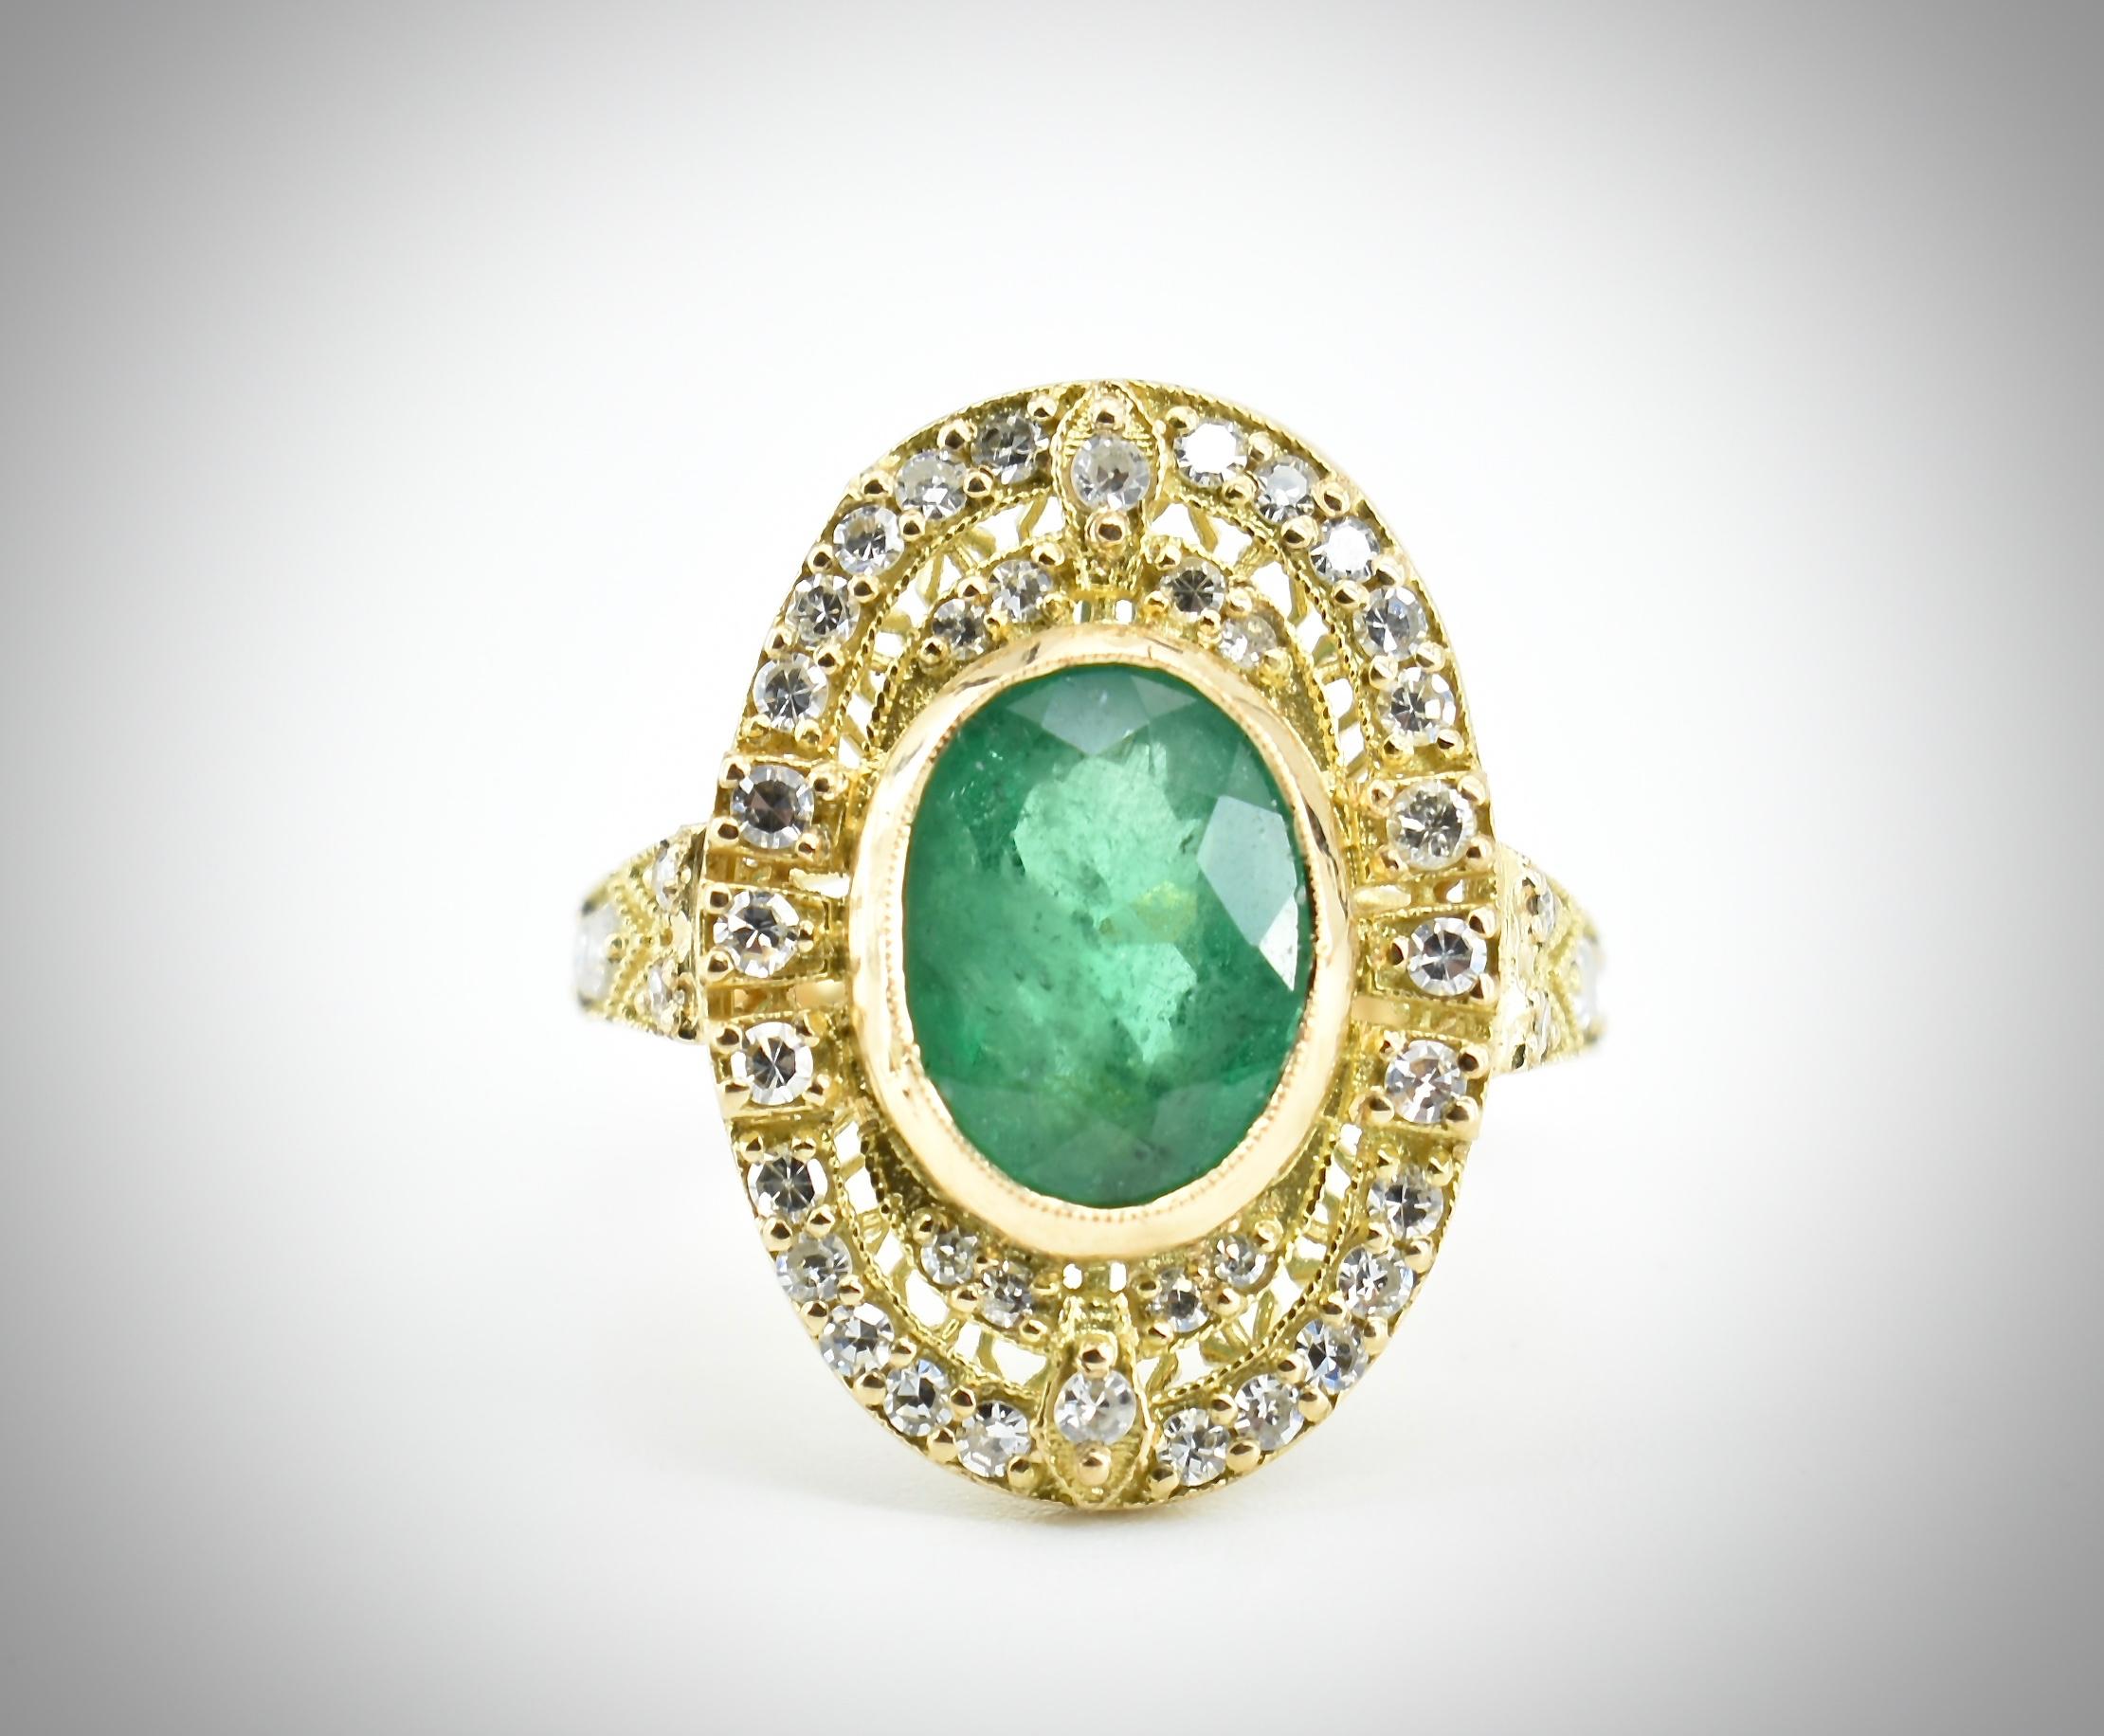 AN 18CT GOLD EMERALD & DIAMOND RING